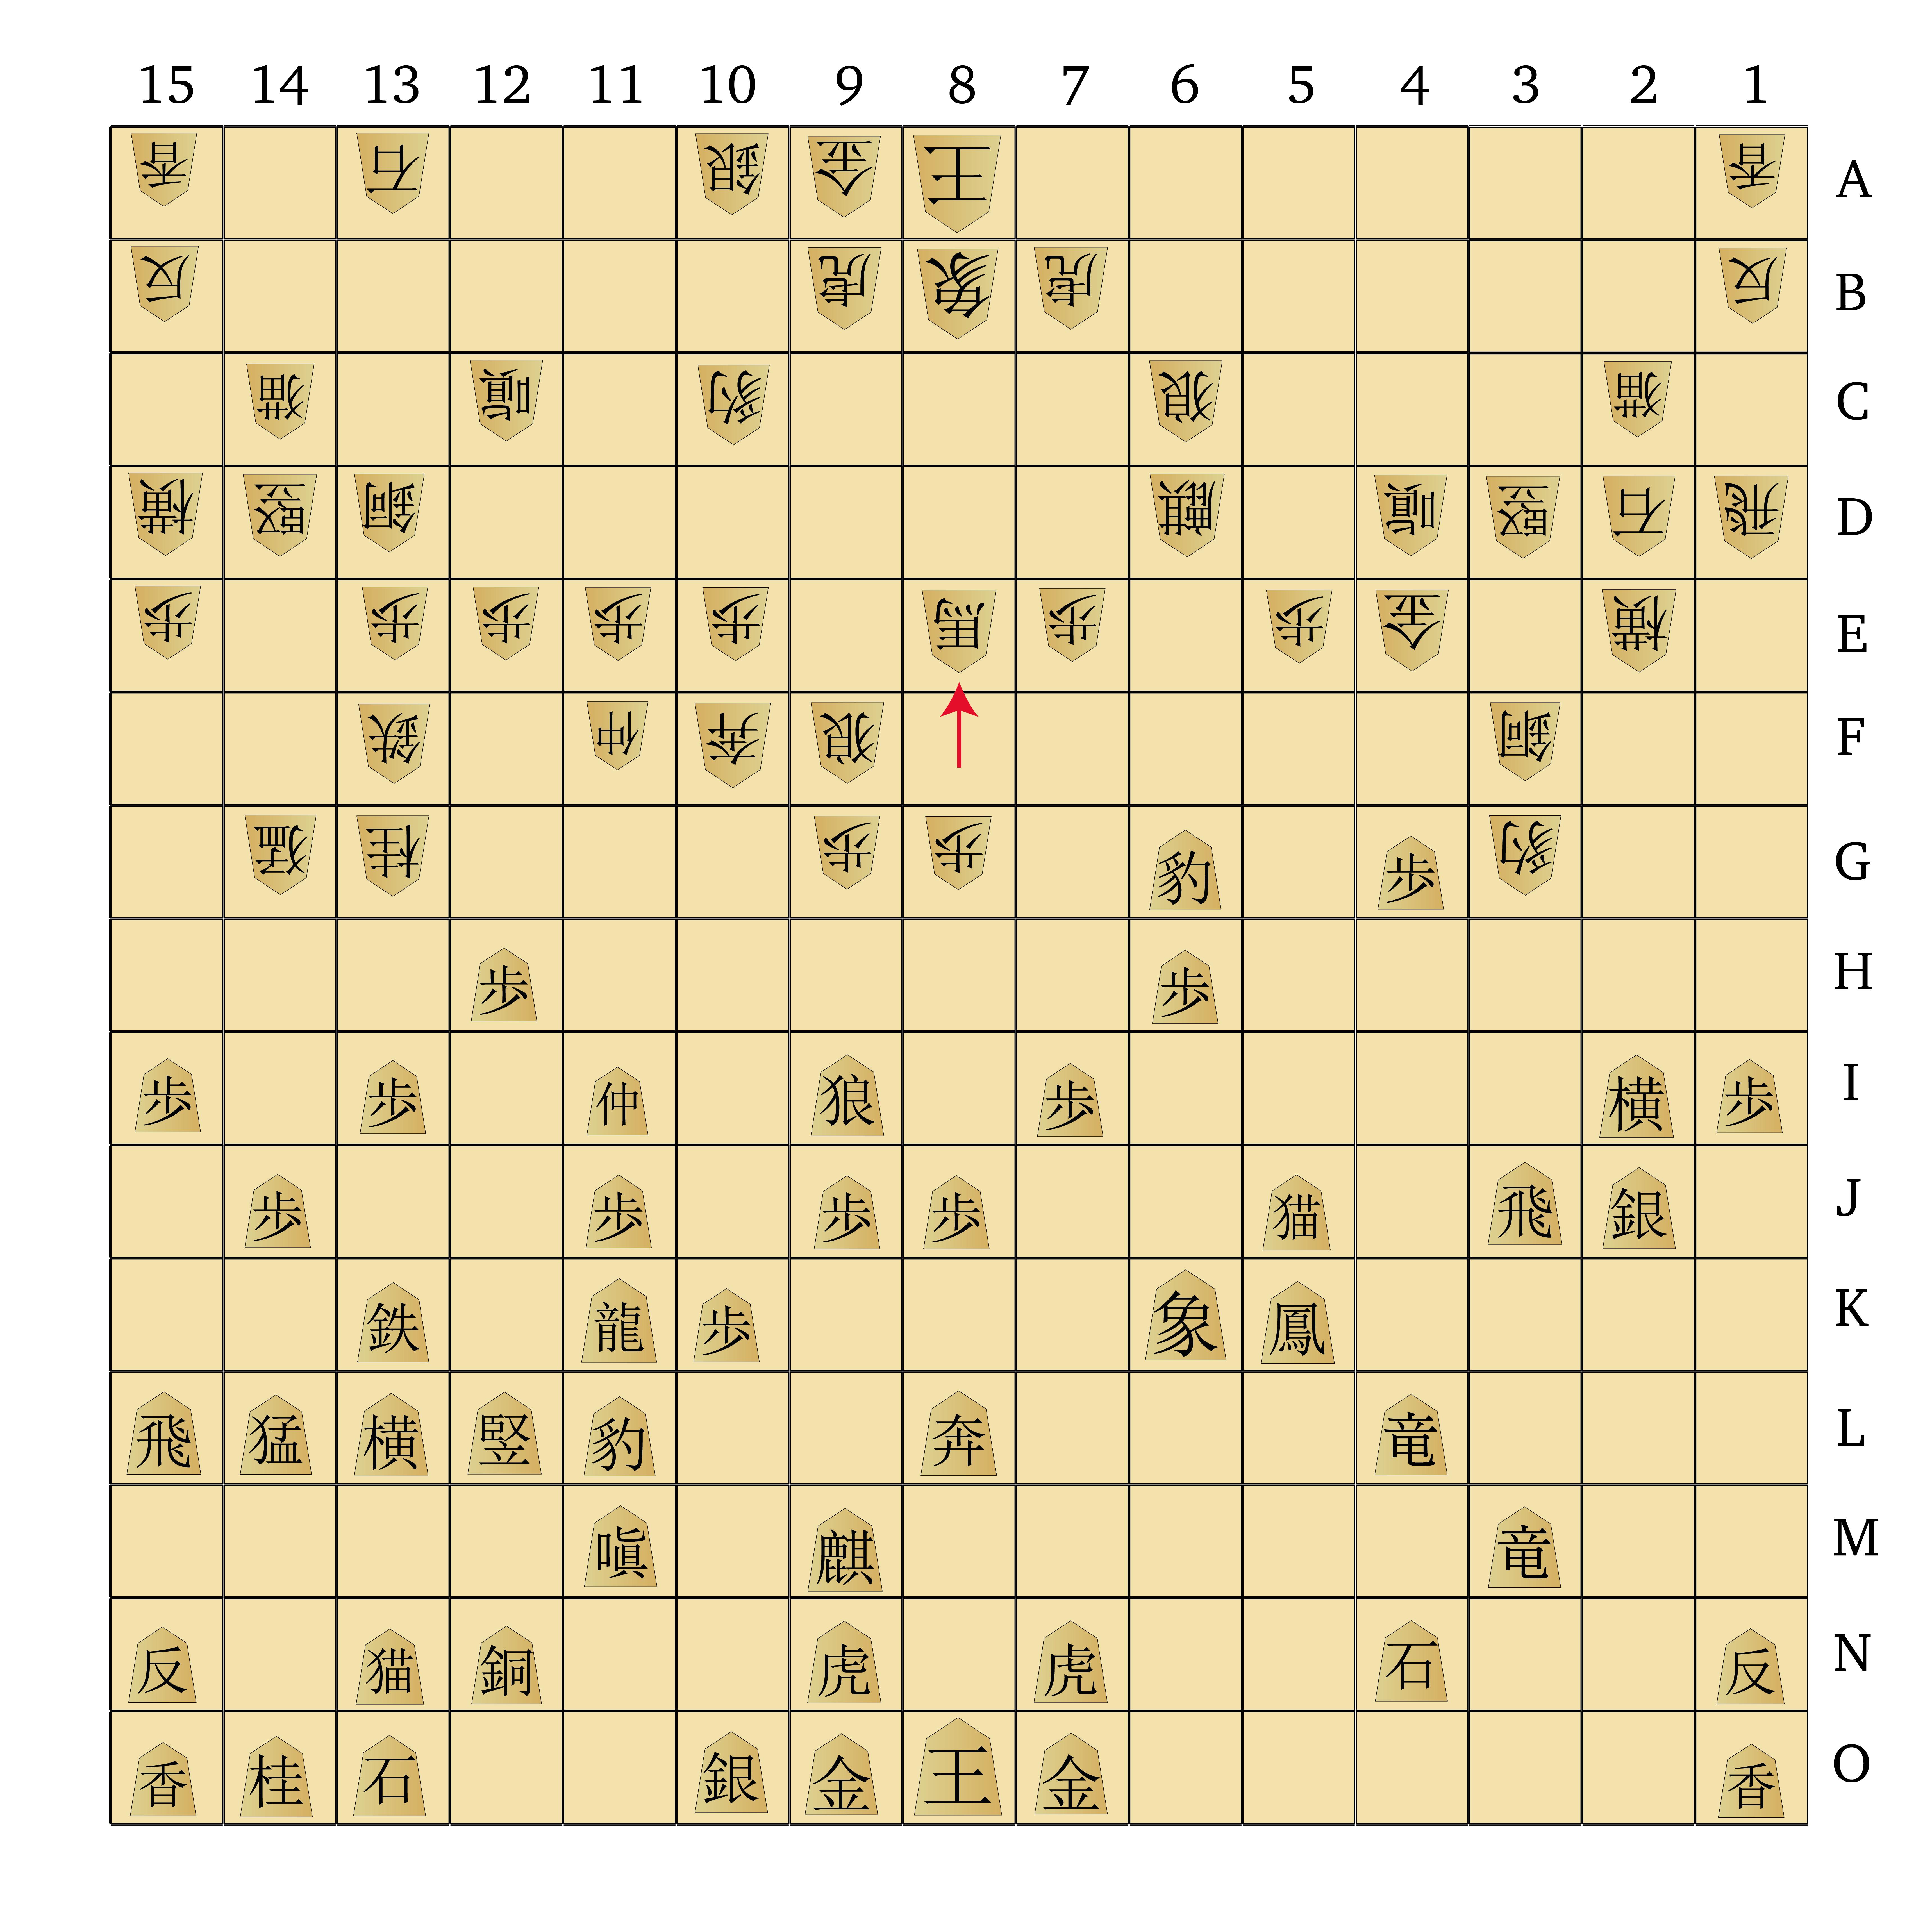 Dai Shogi 420 -- Move 270-01